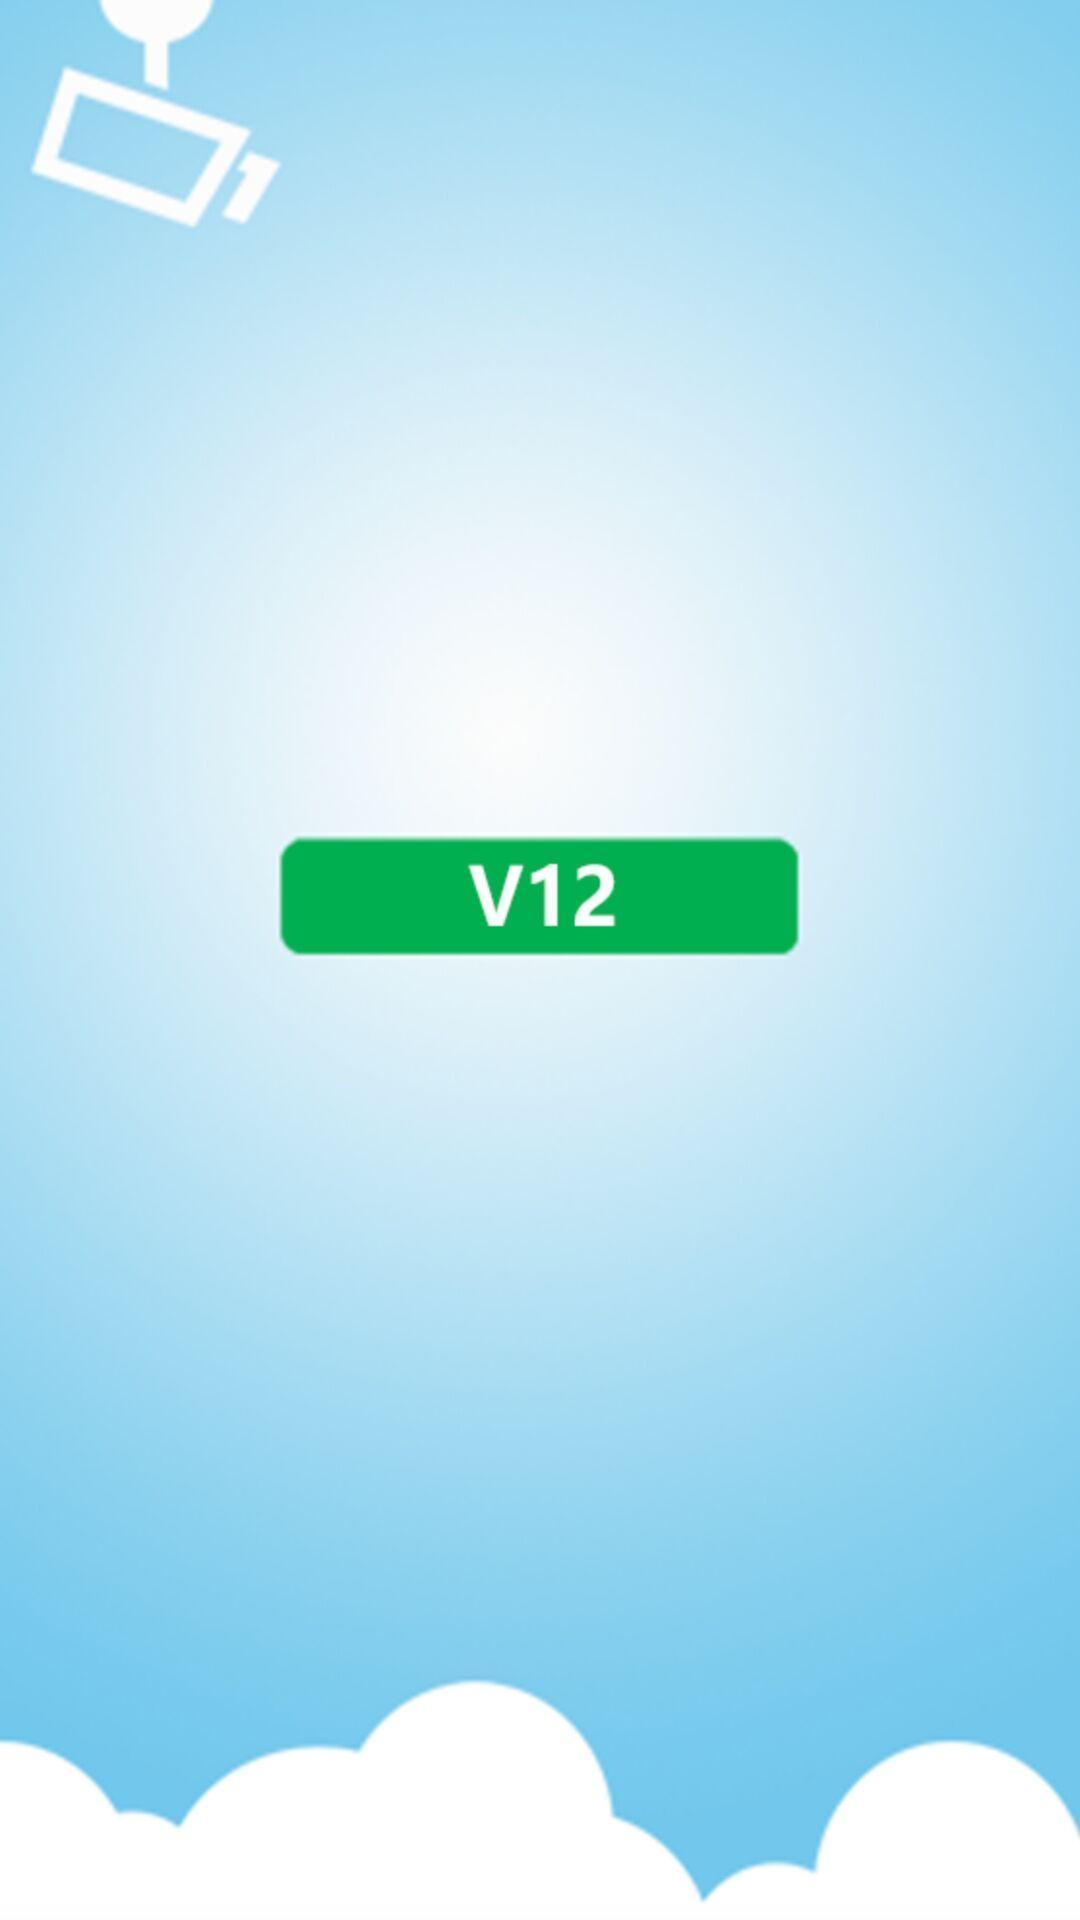 V12 for Android - APK Download